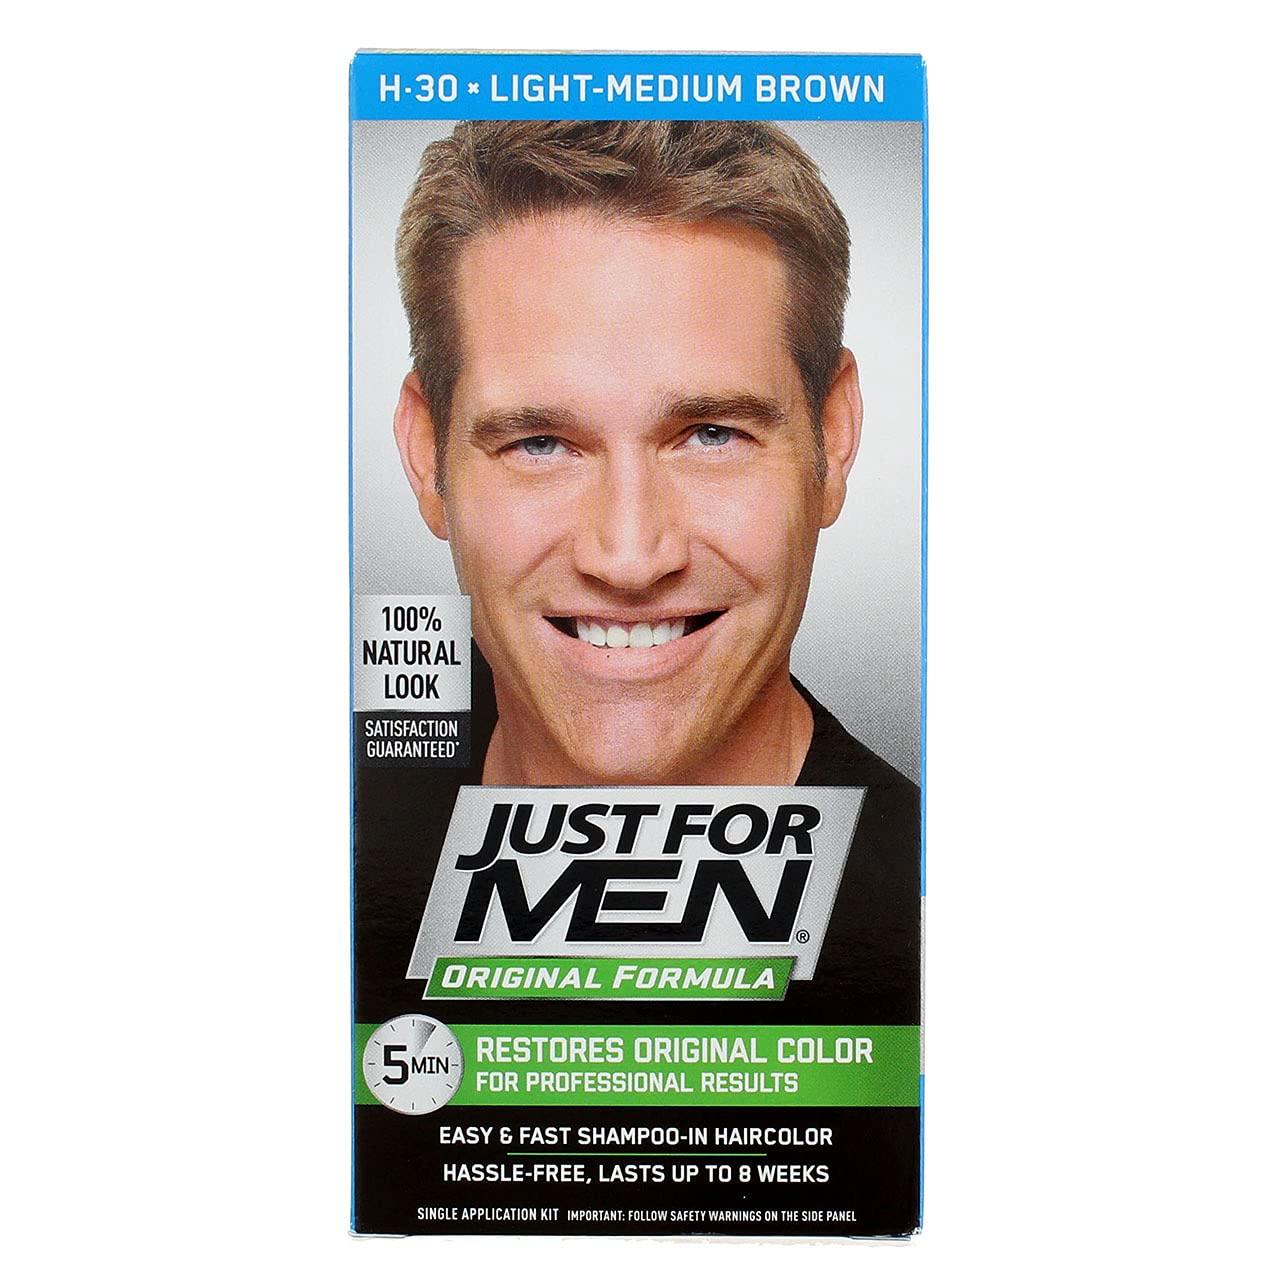 Just For Men Deluxe H-30 Light-Medium Brown of Pack 2 Haircolor 5 ☆ popular